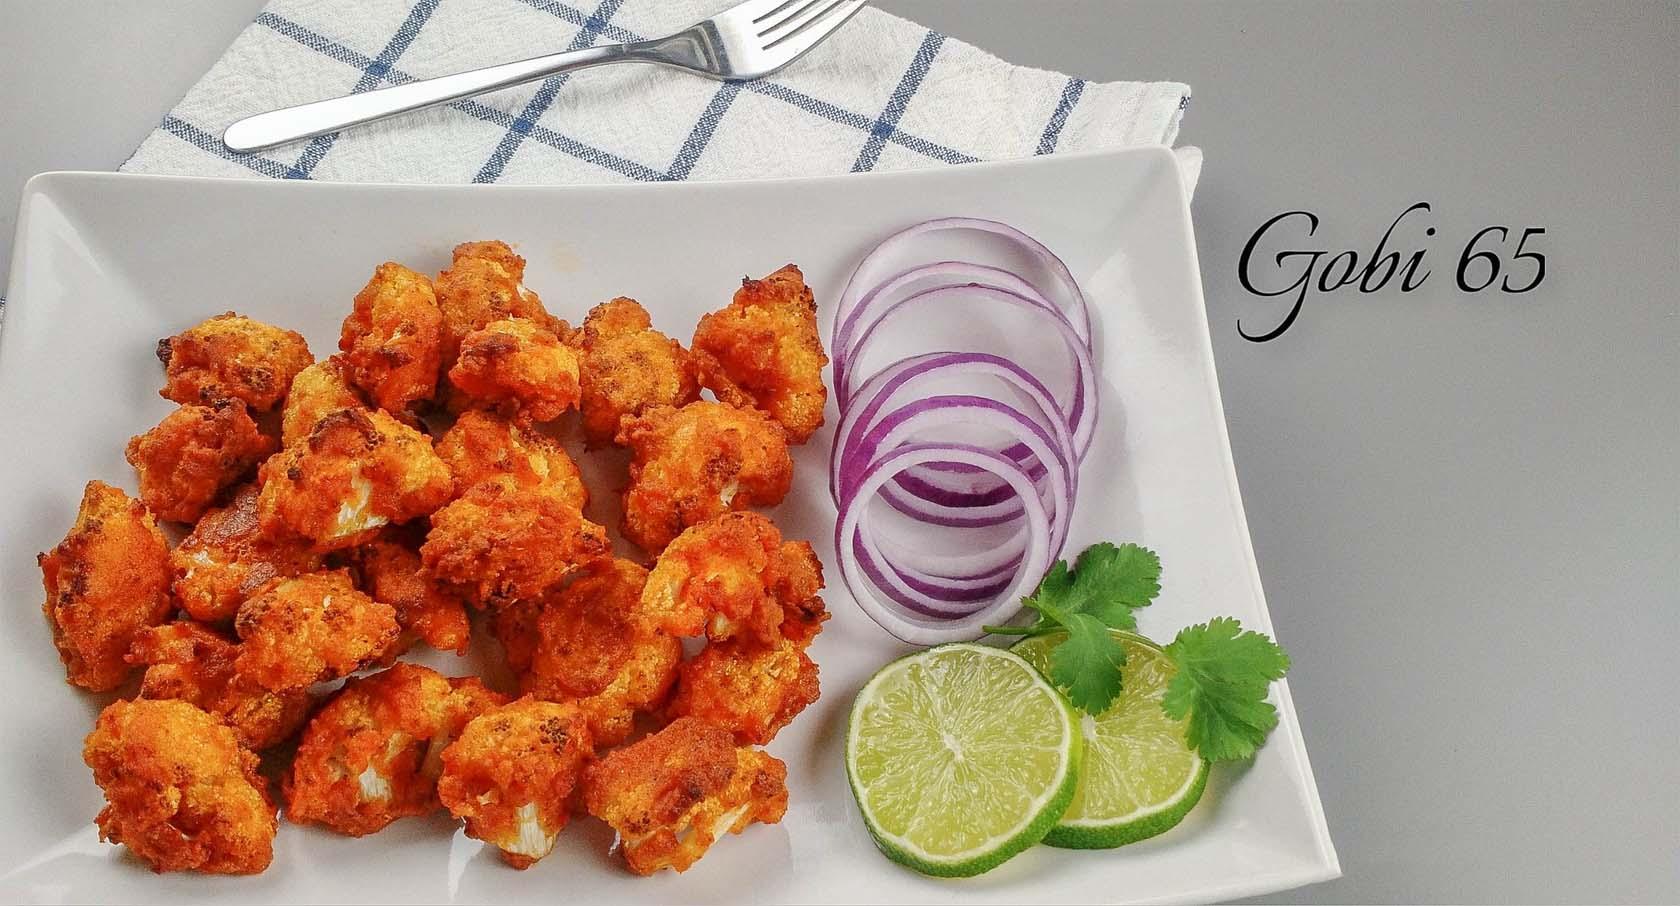 Cook Amazing Gobi 65